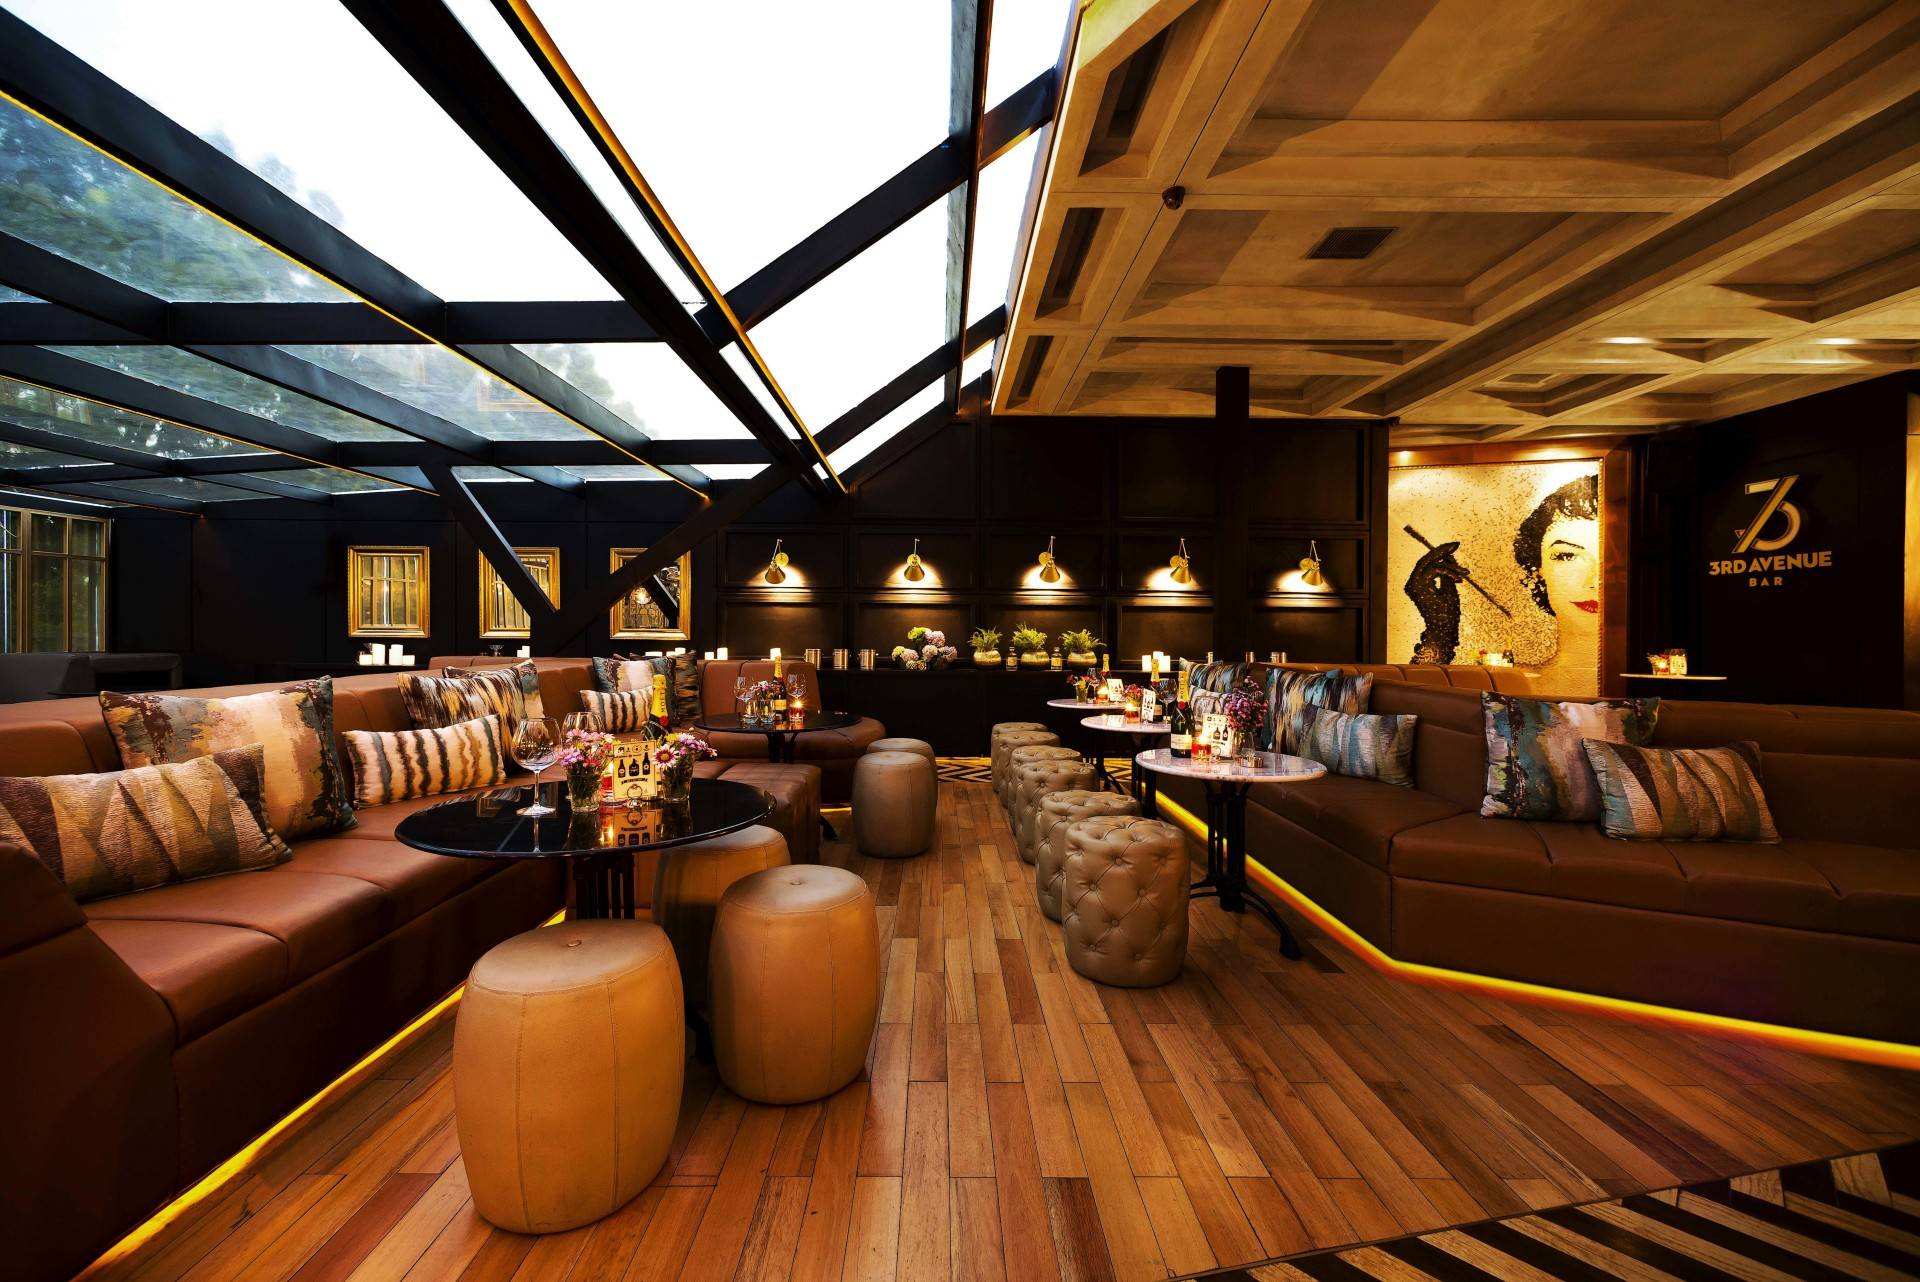 Leo Einstein Fransiscus 3Rd Avenue Senopati 64 Jakarta Senopati 64 Jakarta Seating Area Interior View   7862